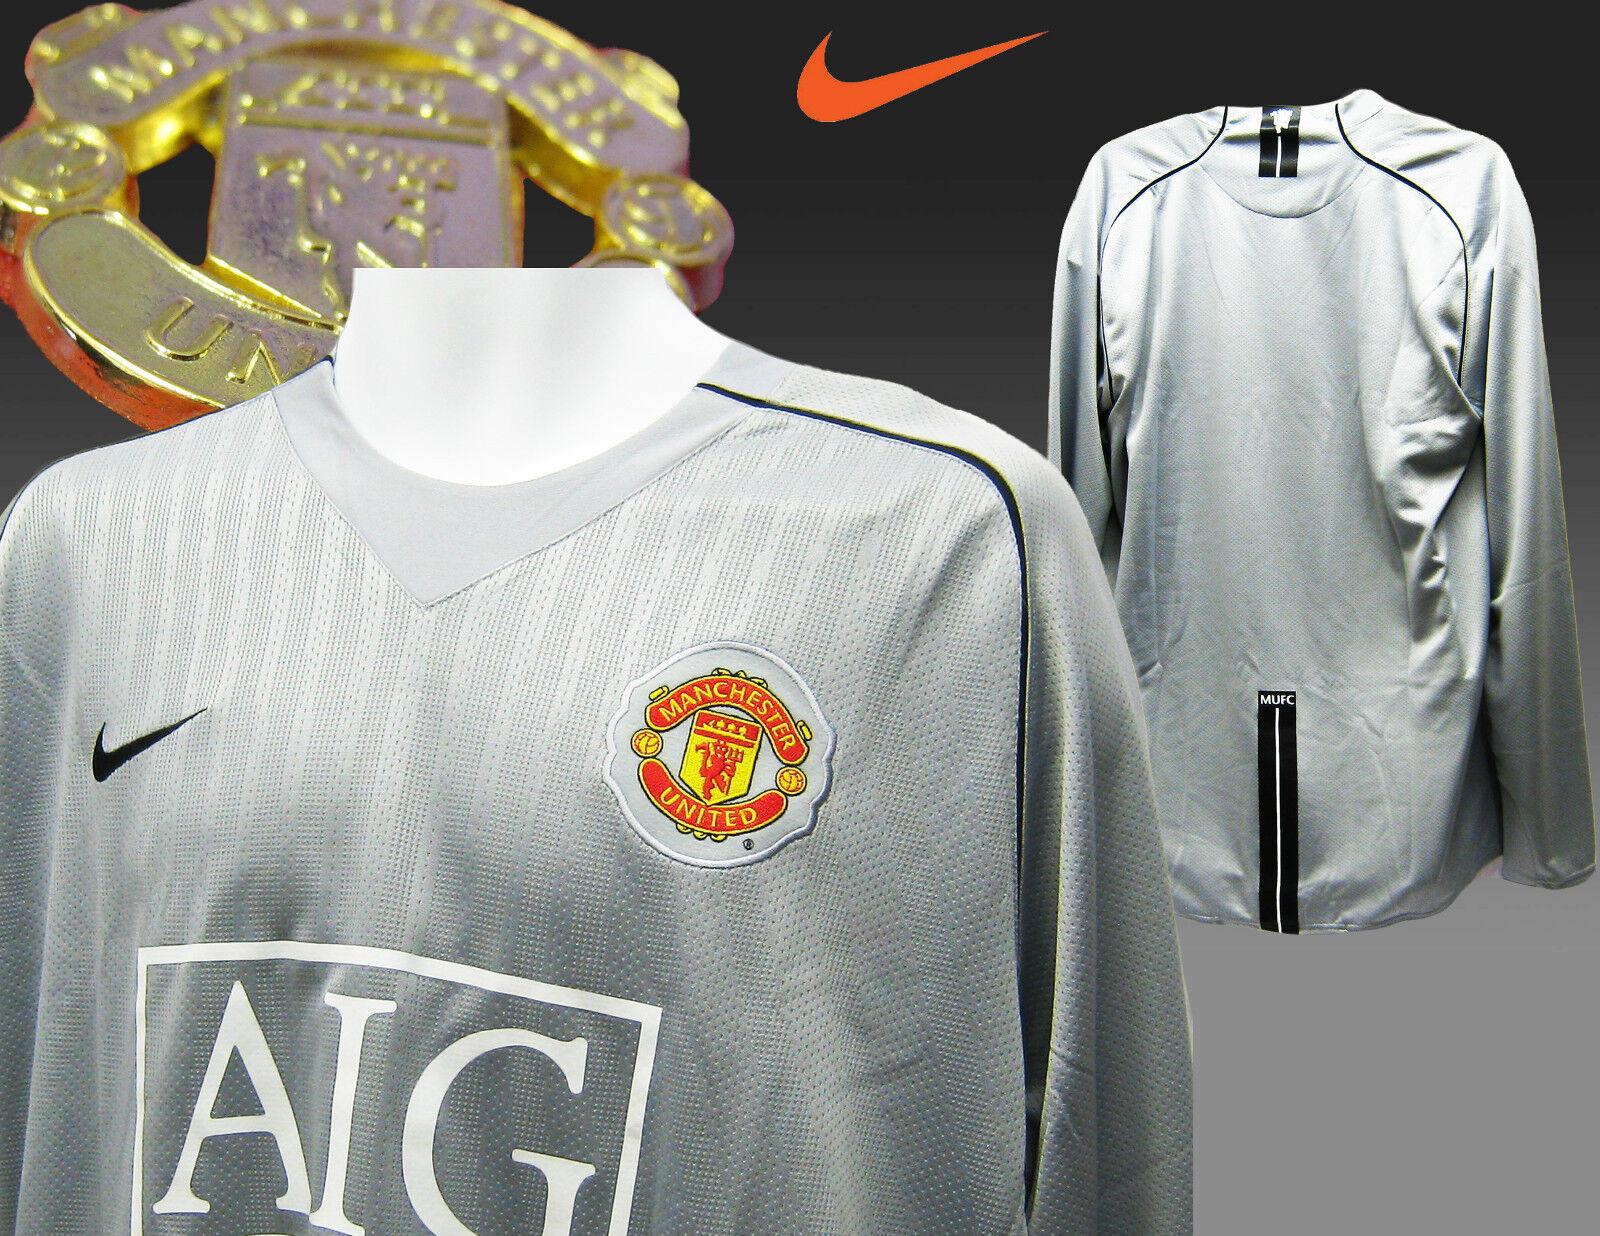 Manchester United Football Club Spieler Ausgabe Gk Torhüter Shirt Silber Grau XL